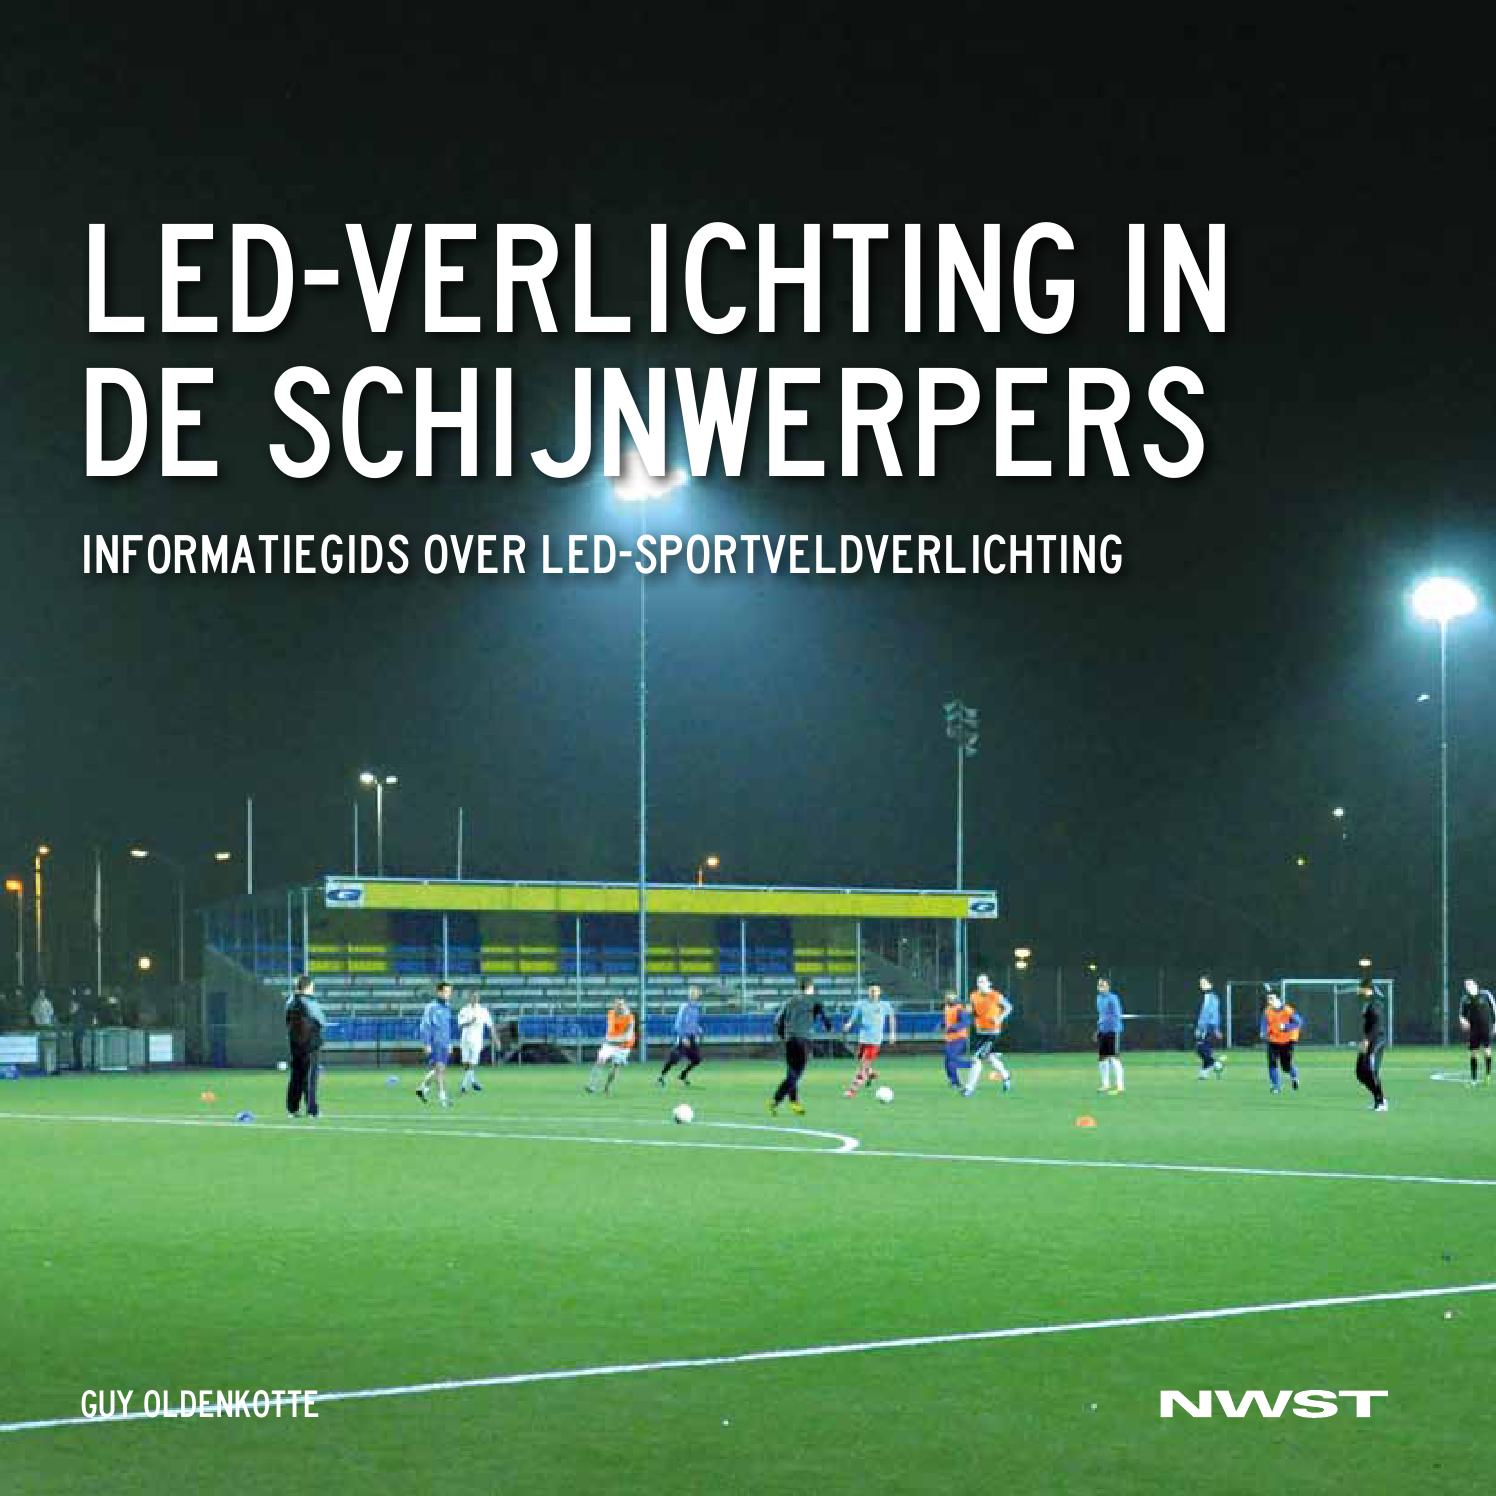 Led-verlichting in de schijnwerpers by NWST NeWSTories - issuu